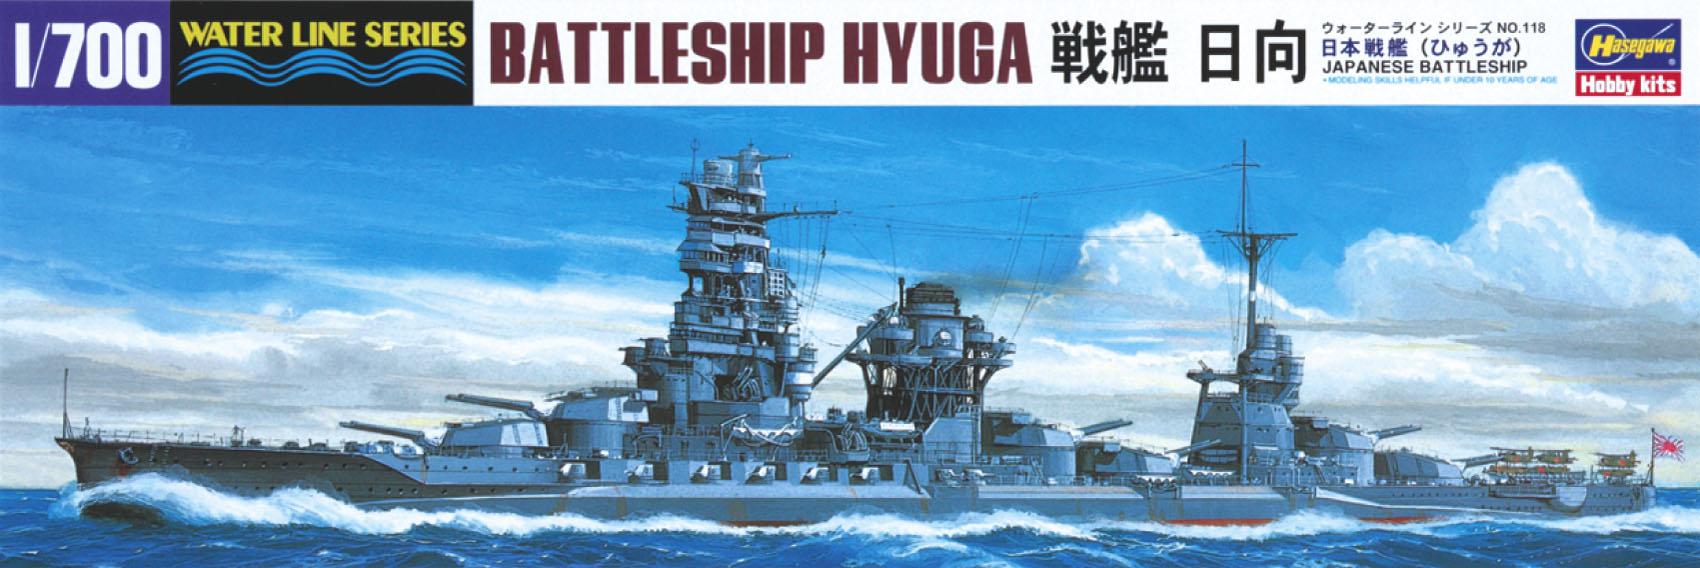 Hasegawa Ijn Battleship Hyuga